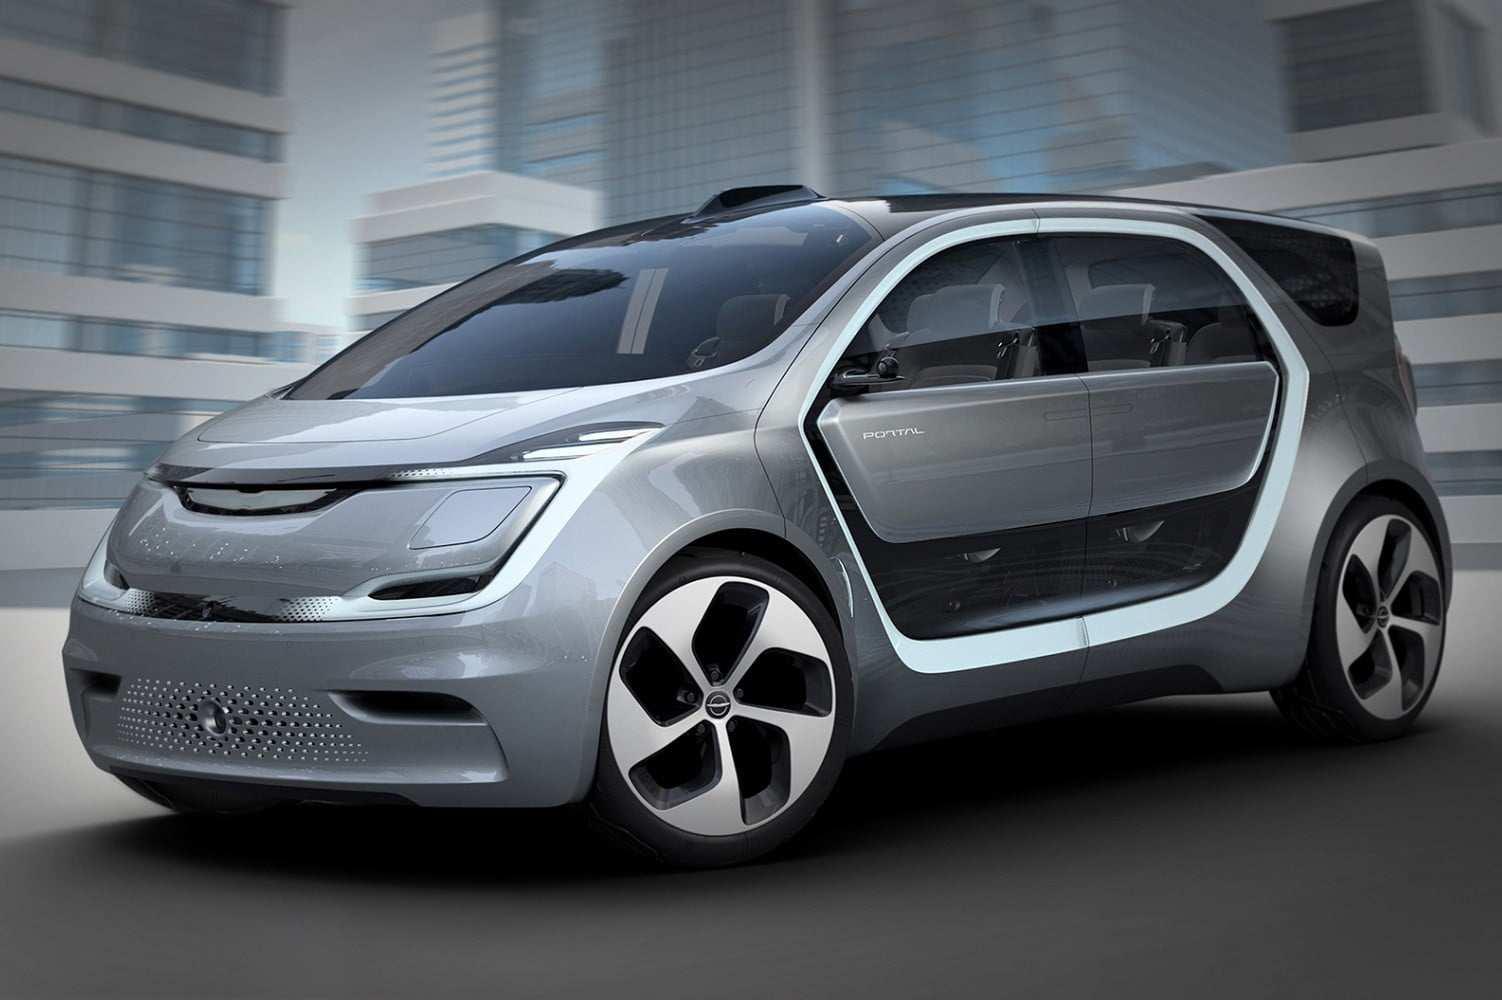 82 Concept of 2019 Chrysler Portal Specs with 2019 Chrysler Portal